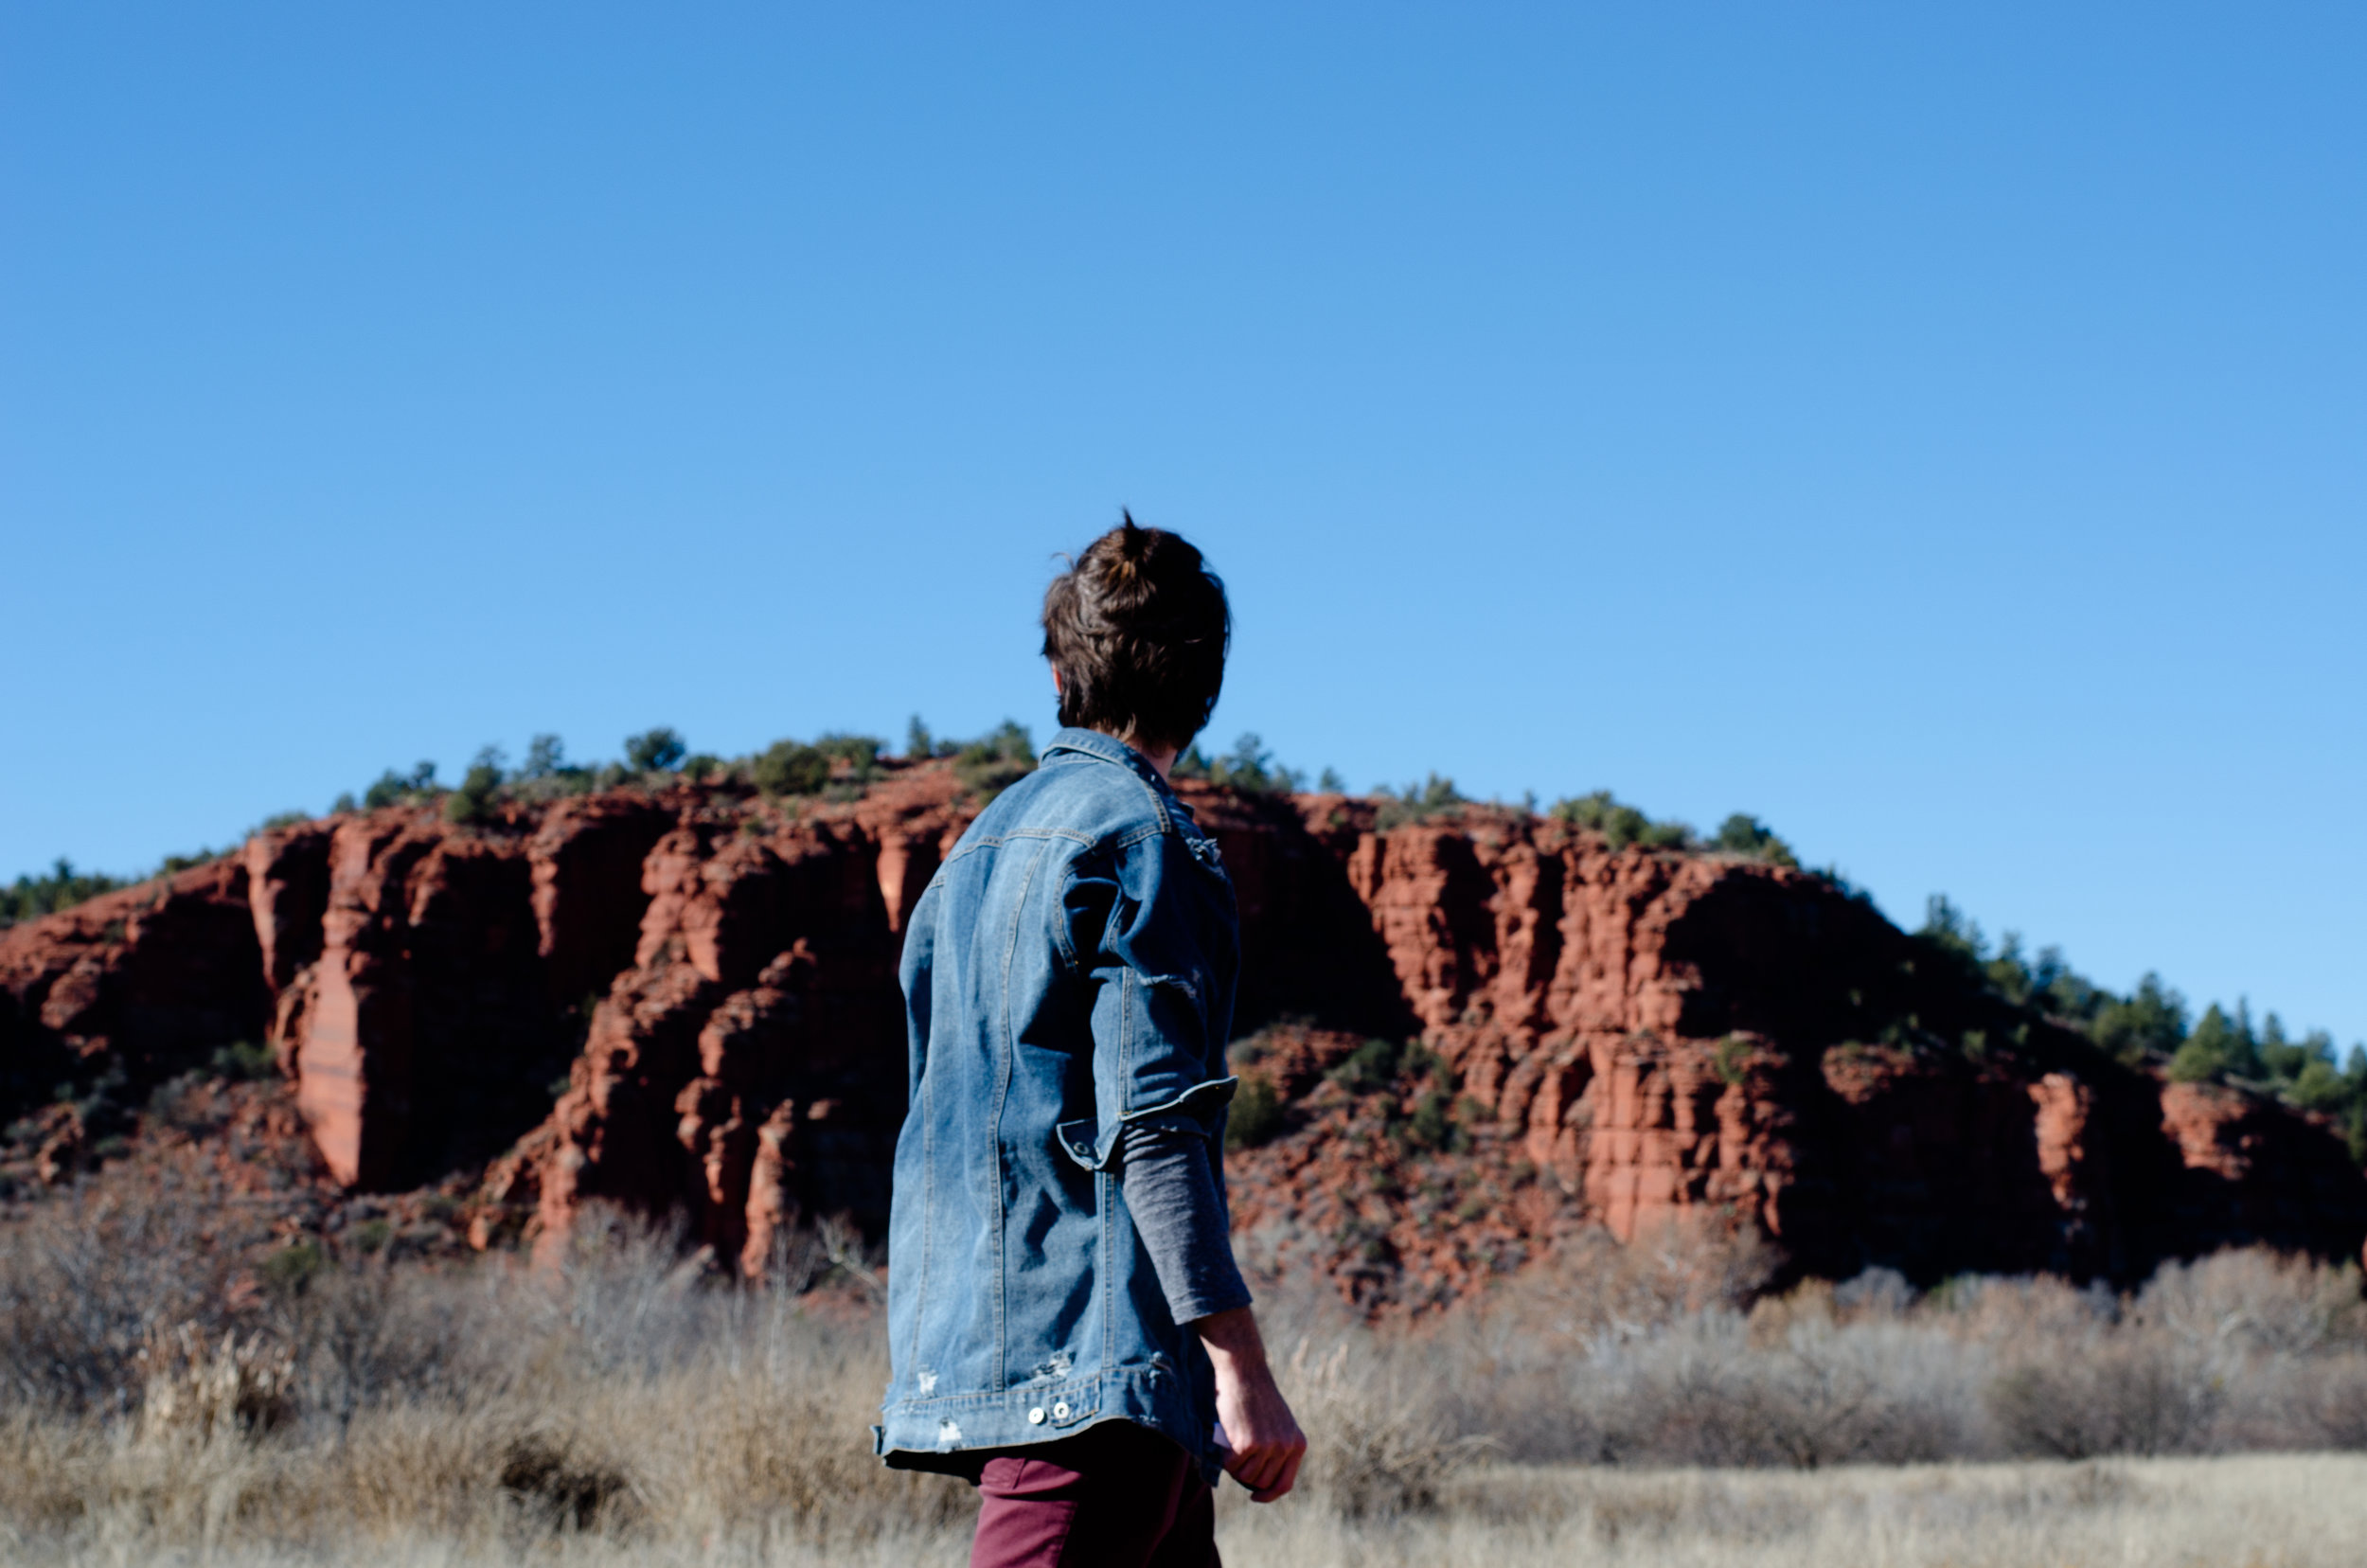 Walking around Red Rock State Park